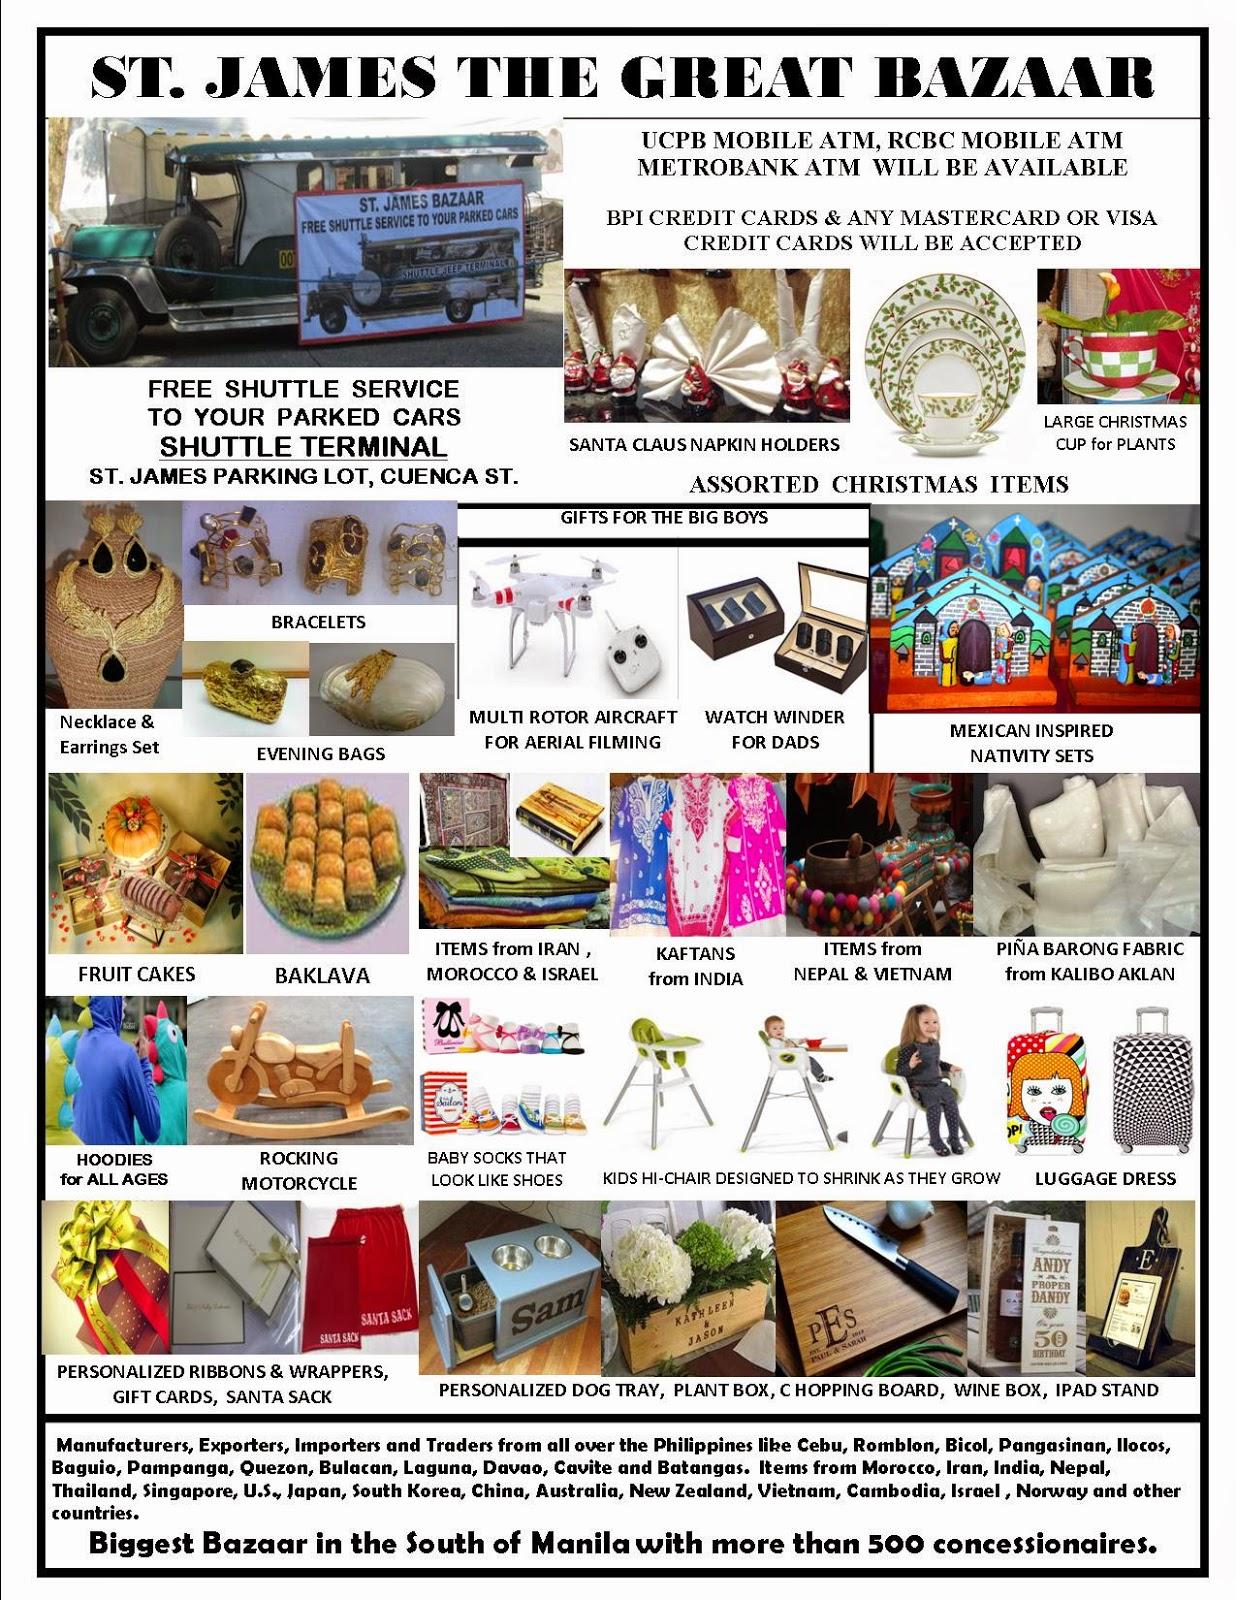 http://www.boy-kuripot.com/2014/11/manila-christmas-bazaars-2014.html